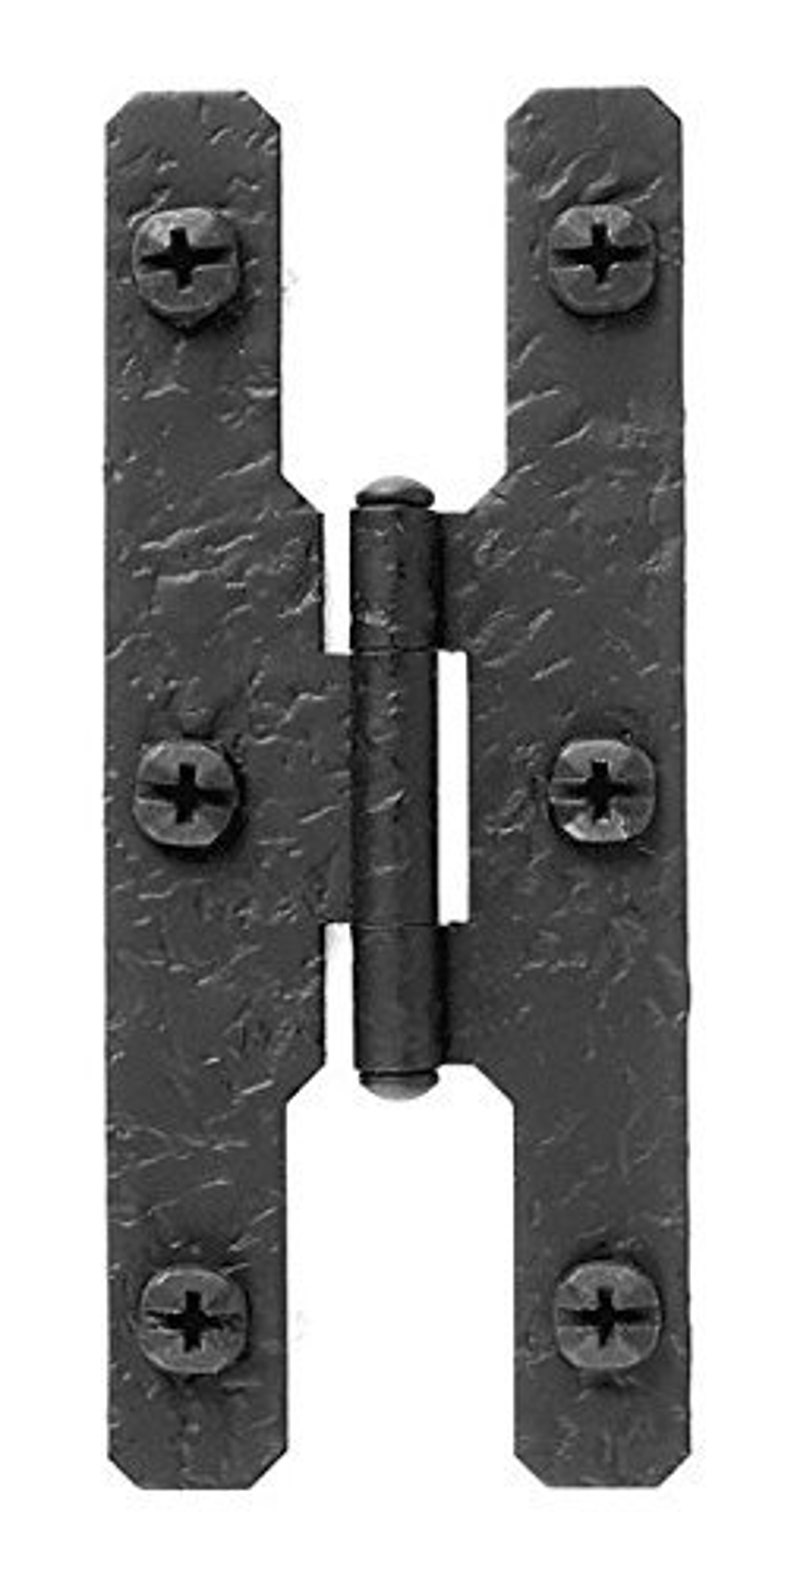 Flush Rough Iron Non-Self Closing H Style Door Hinge 7 H \u00d7 2.63 by Acorn